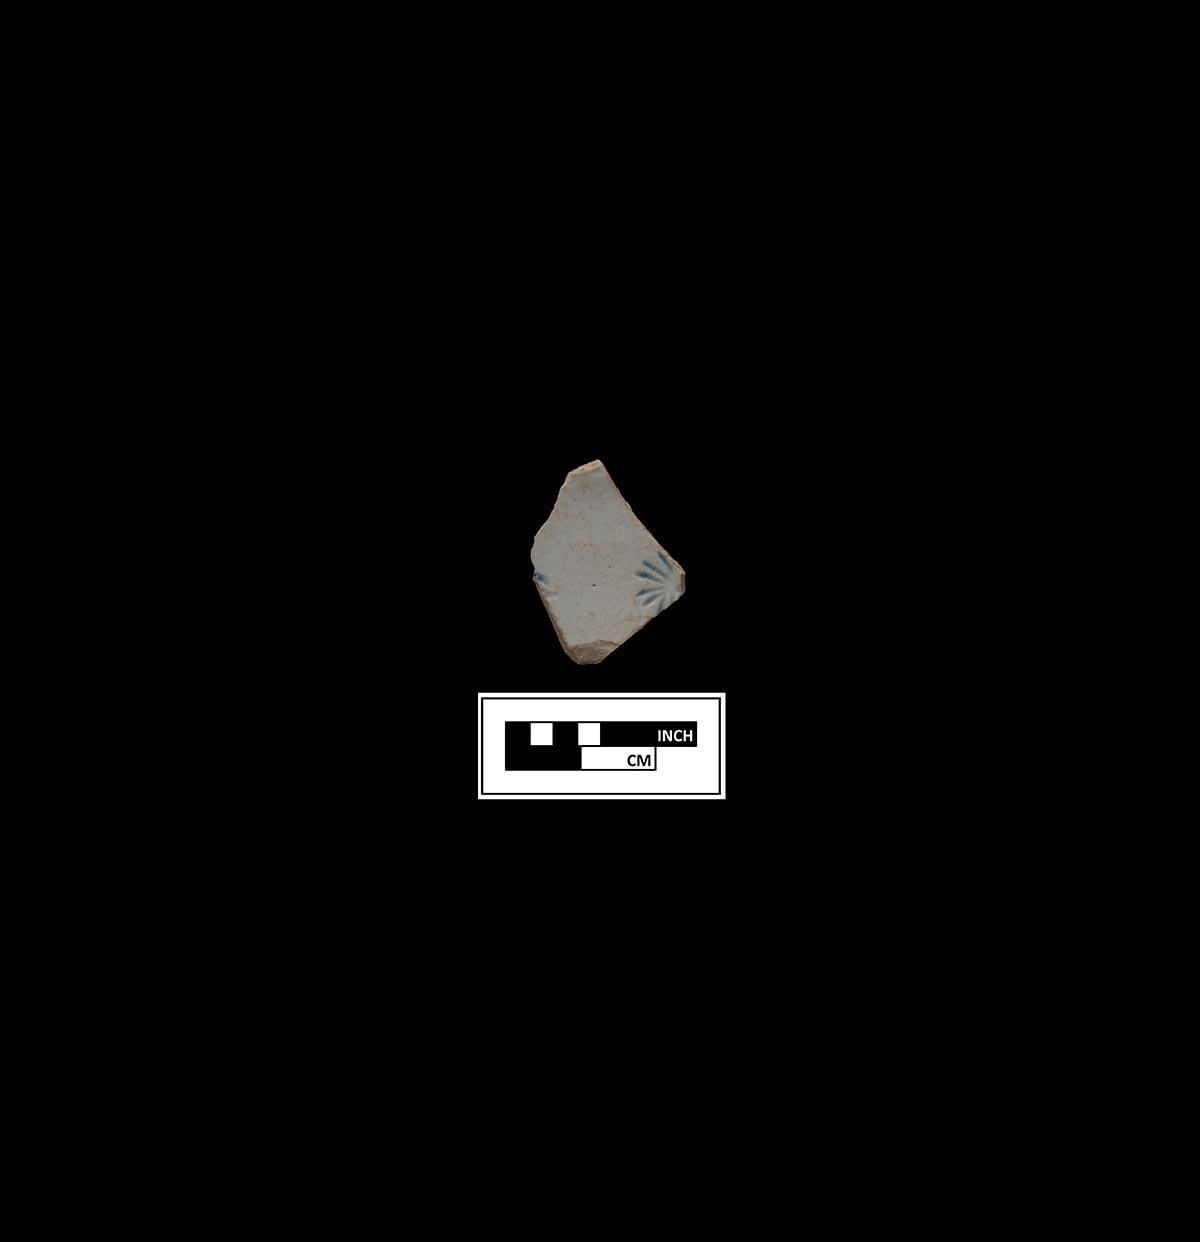 18ST1-270-CNEHA-Image-2-3-4